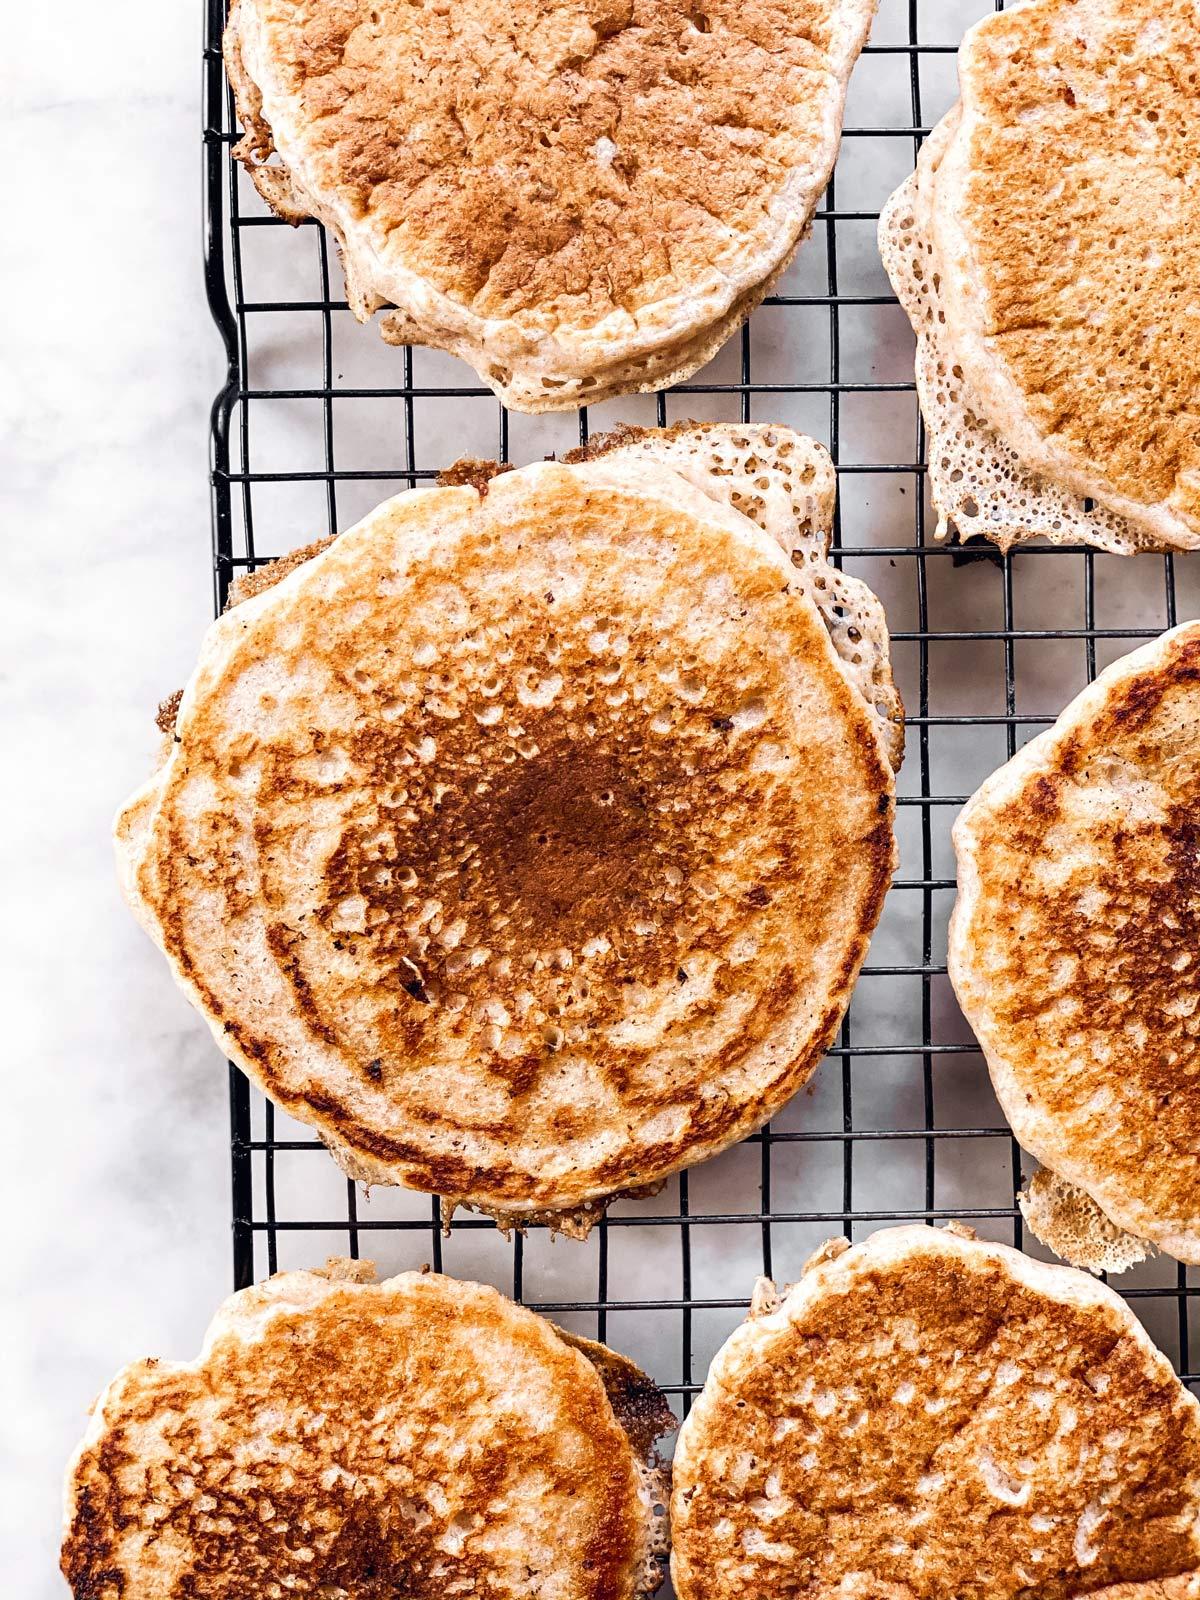 sourdough pancakes on black wire rack